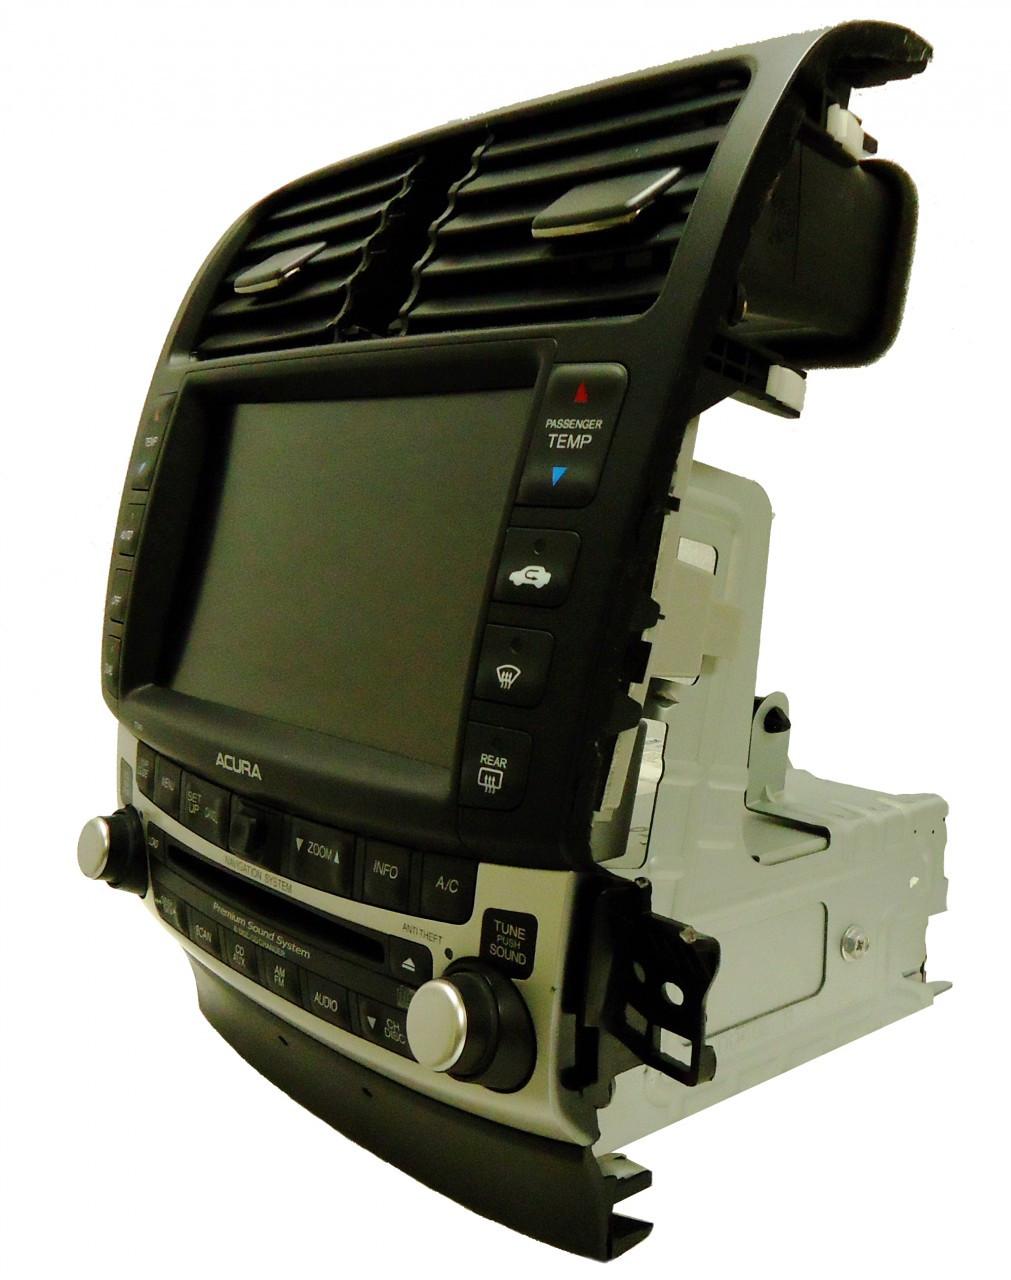 04 05 06 07 08 ACURA TSX Premium Navigation GPS Radio 6 CD ...